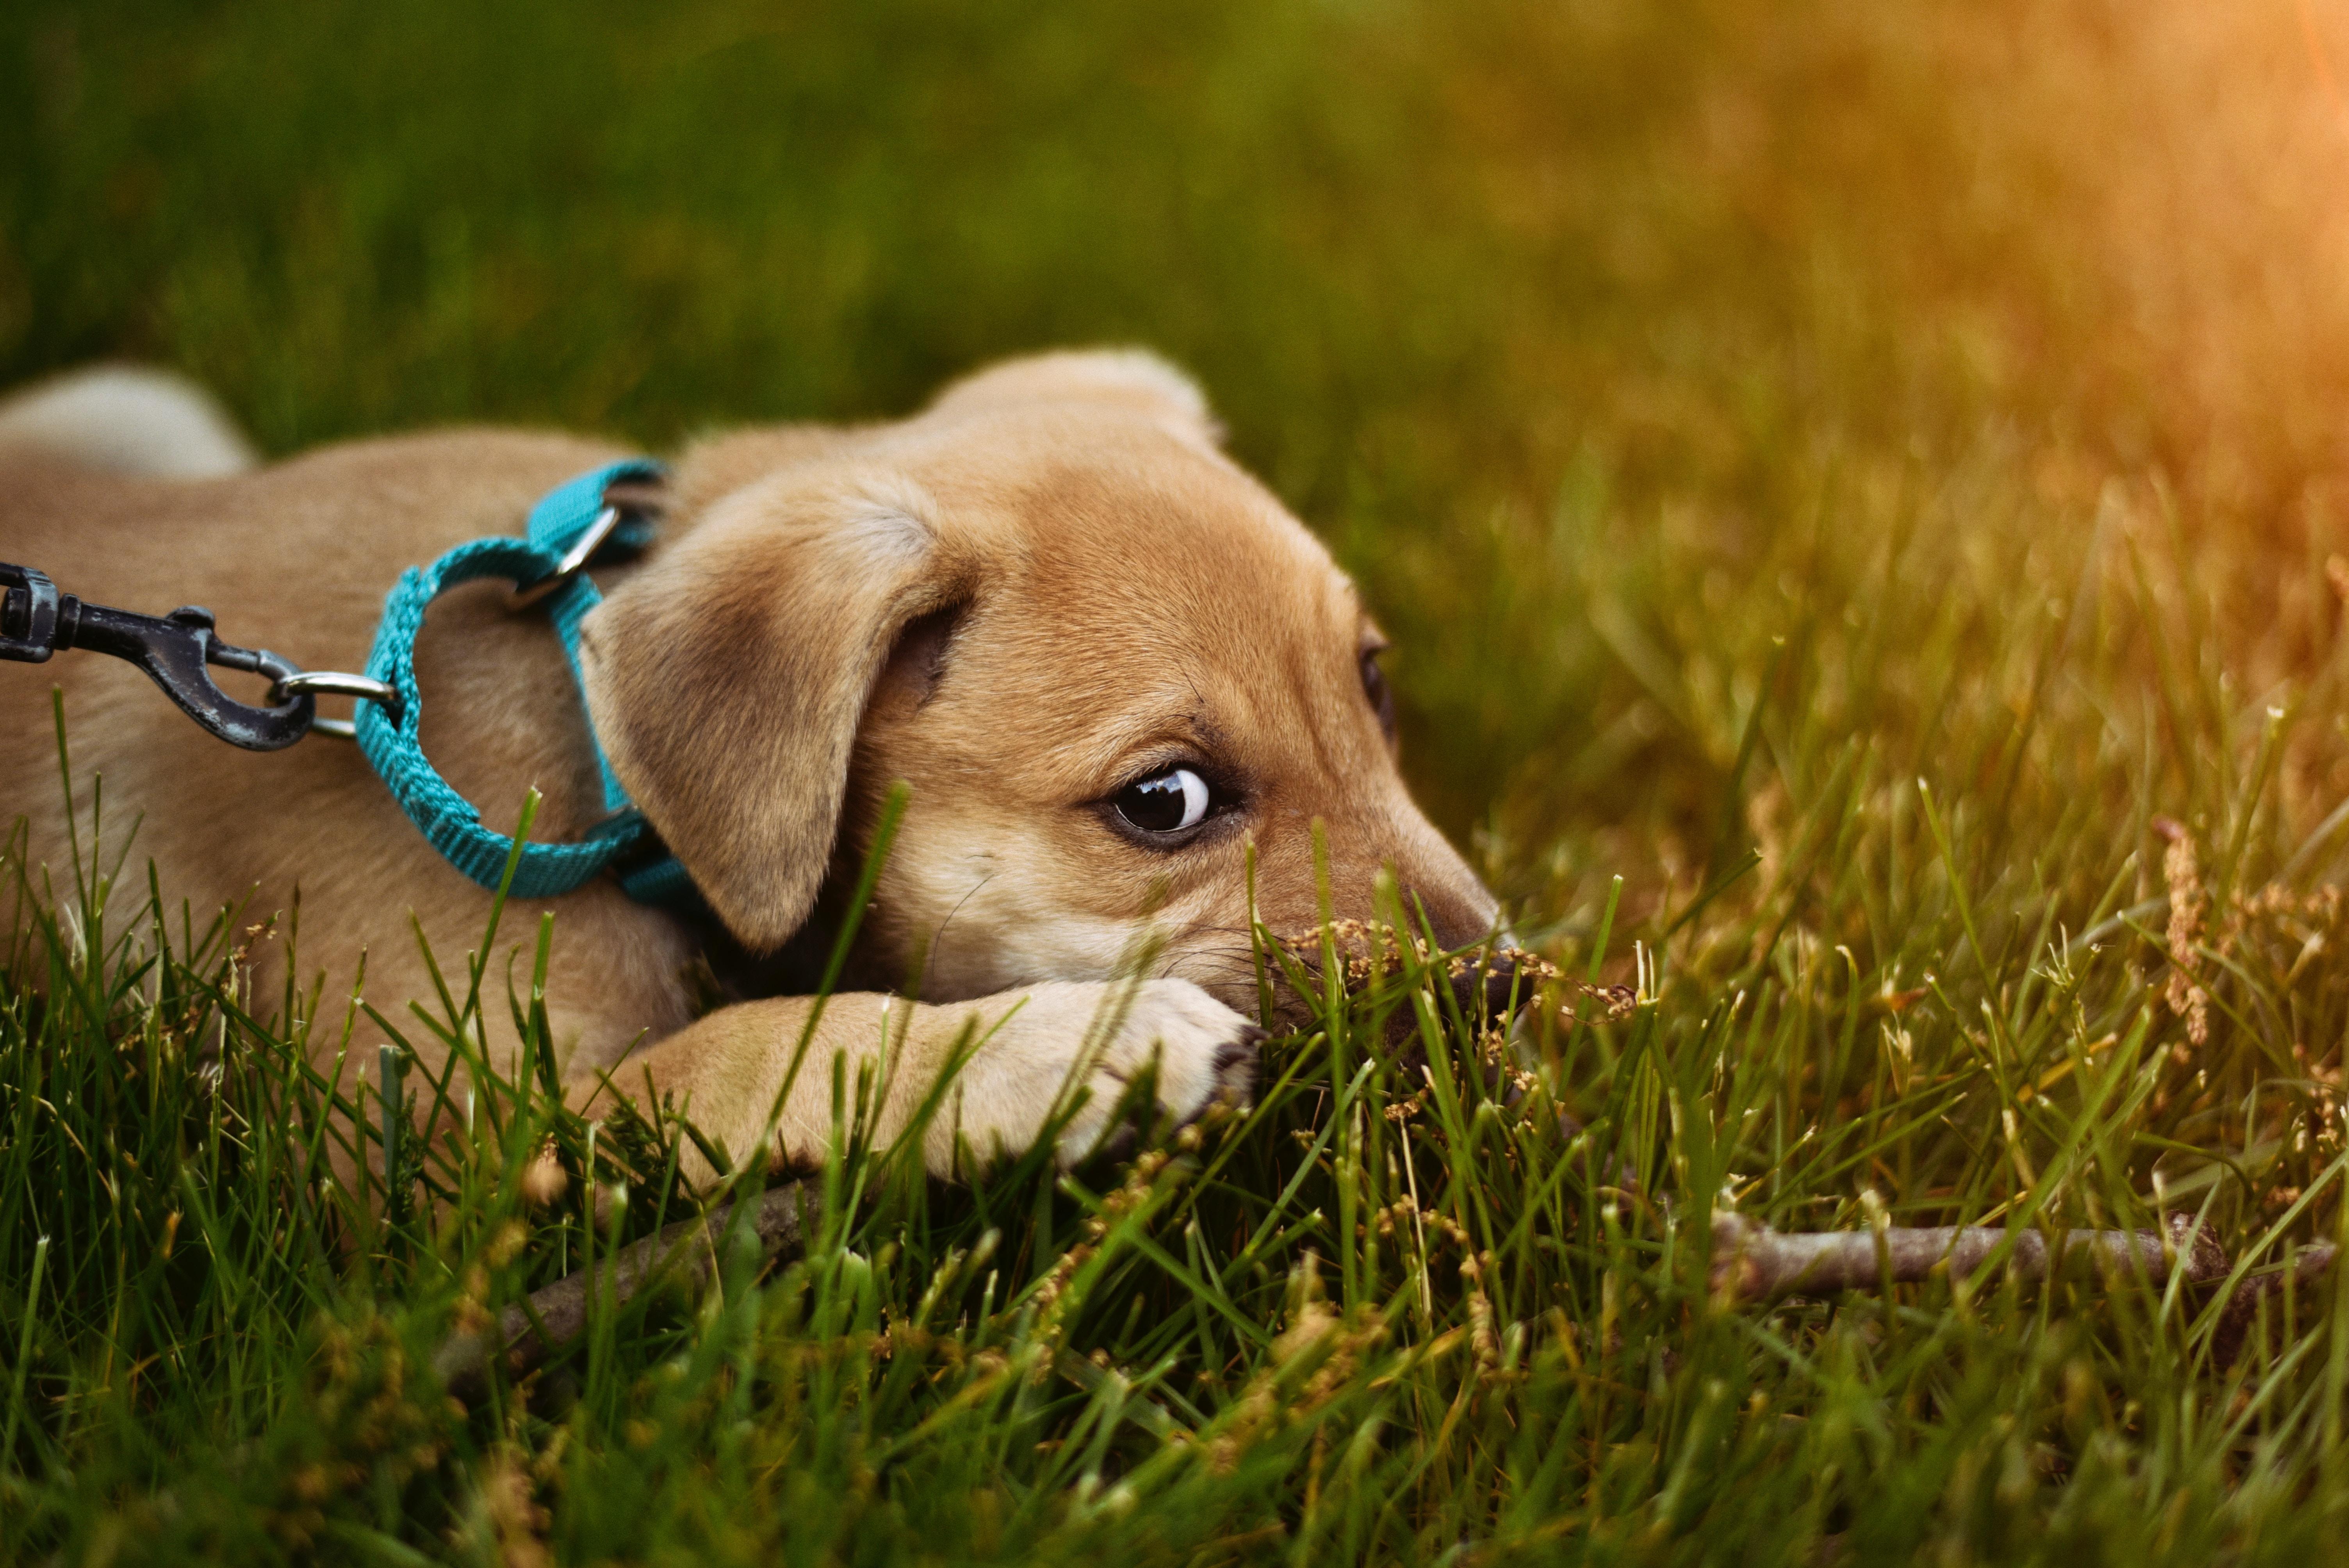 Chien-dans-l'herbe